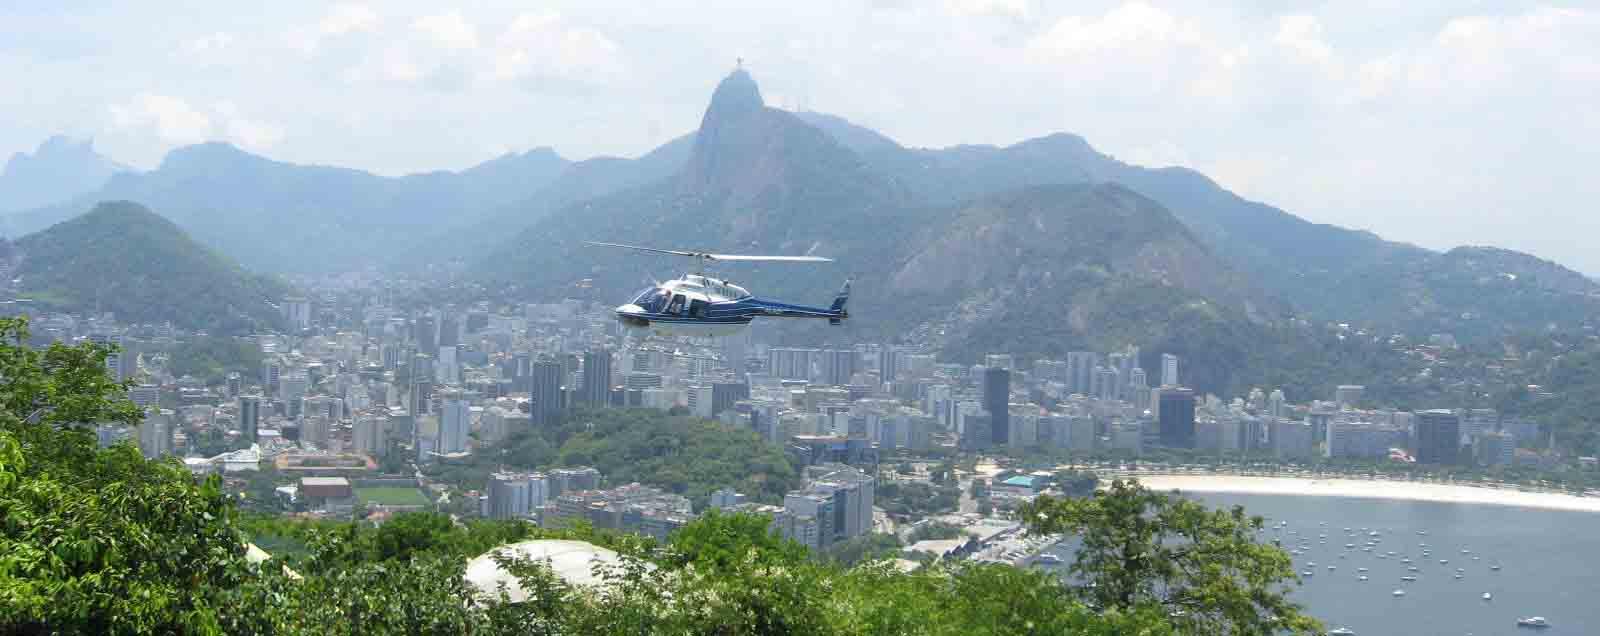 Passeio de Helicóptero no Rio